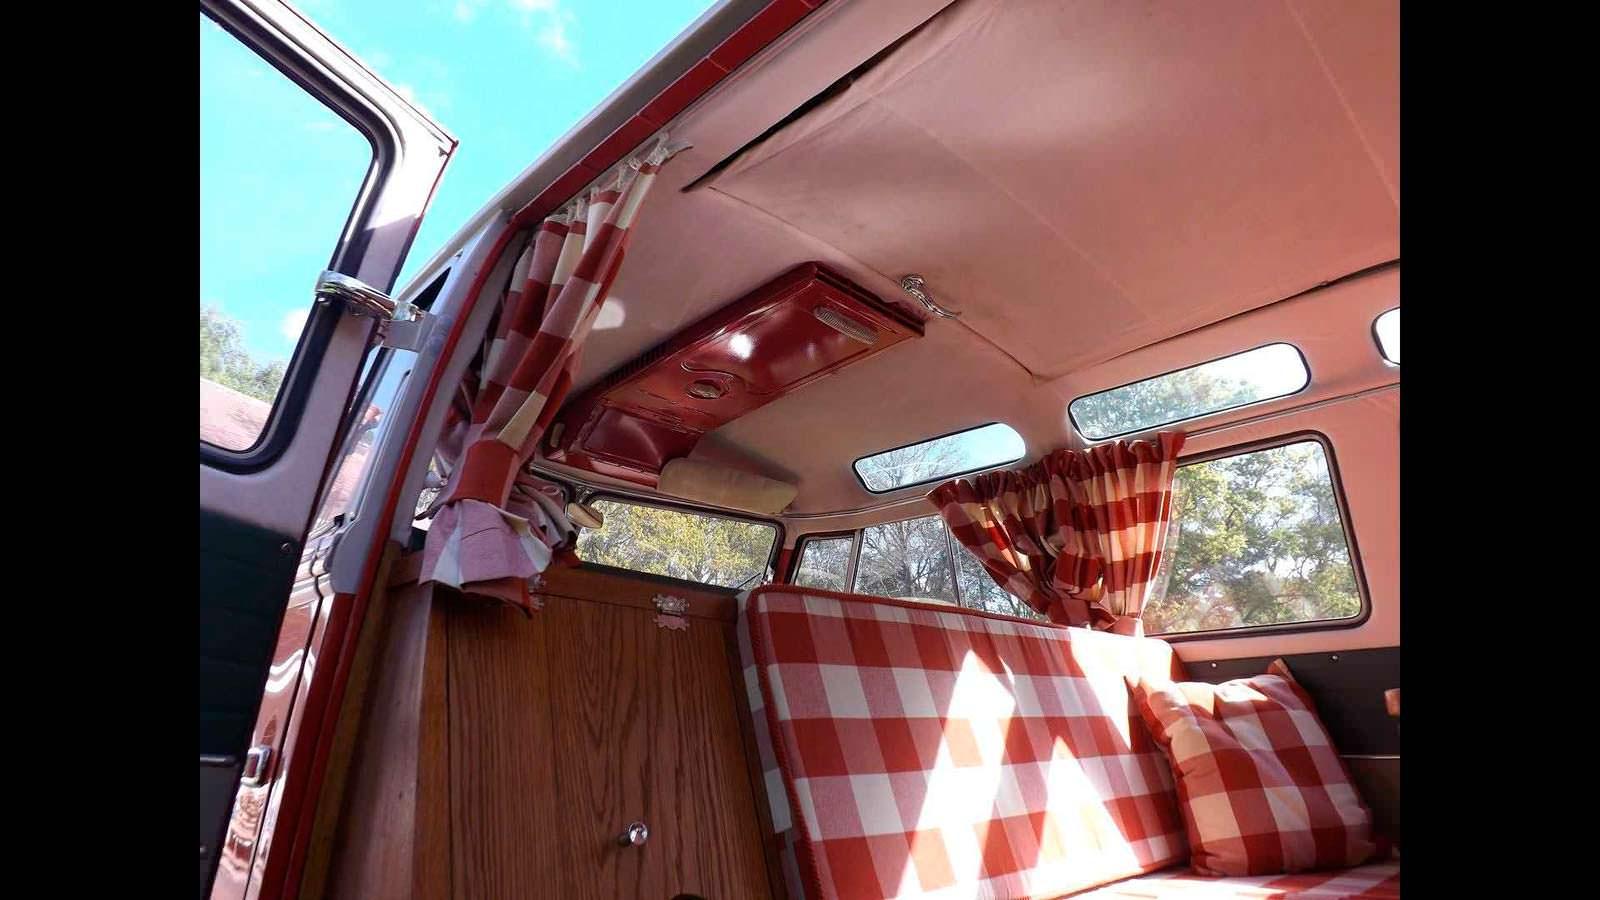 Фото | Интерьер Volkswagen T1 Samba 1959 года выпуска